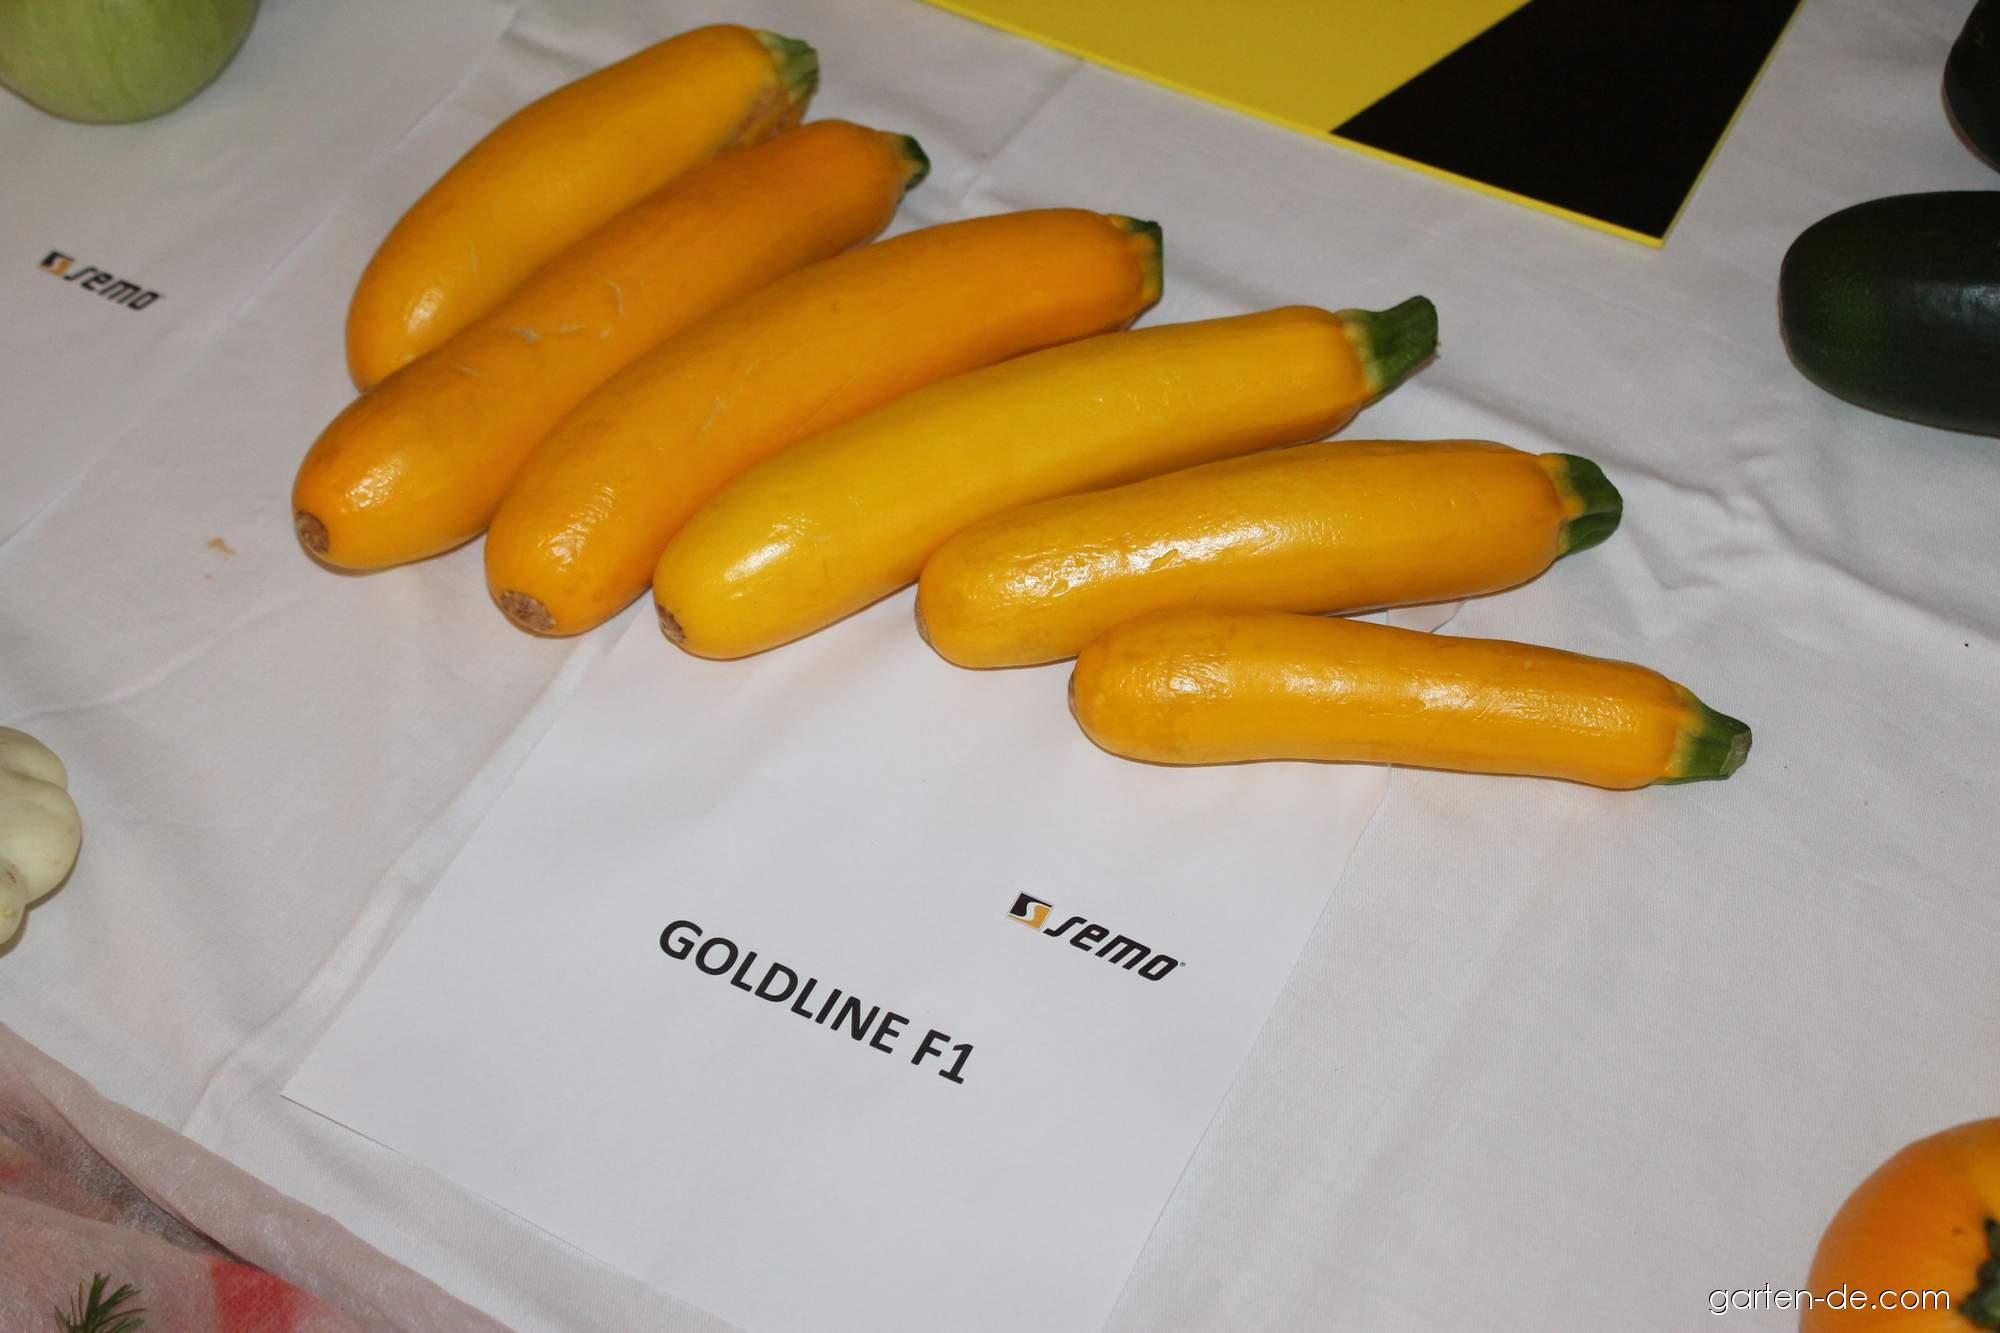 Tykev obecná - cuketa Goldline (Cucurbita pepo)